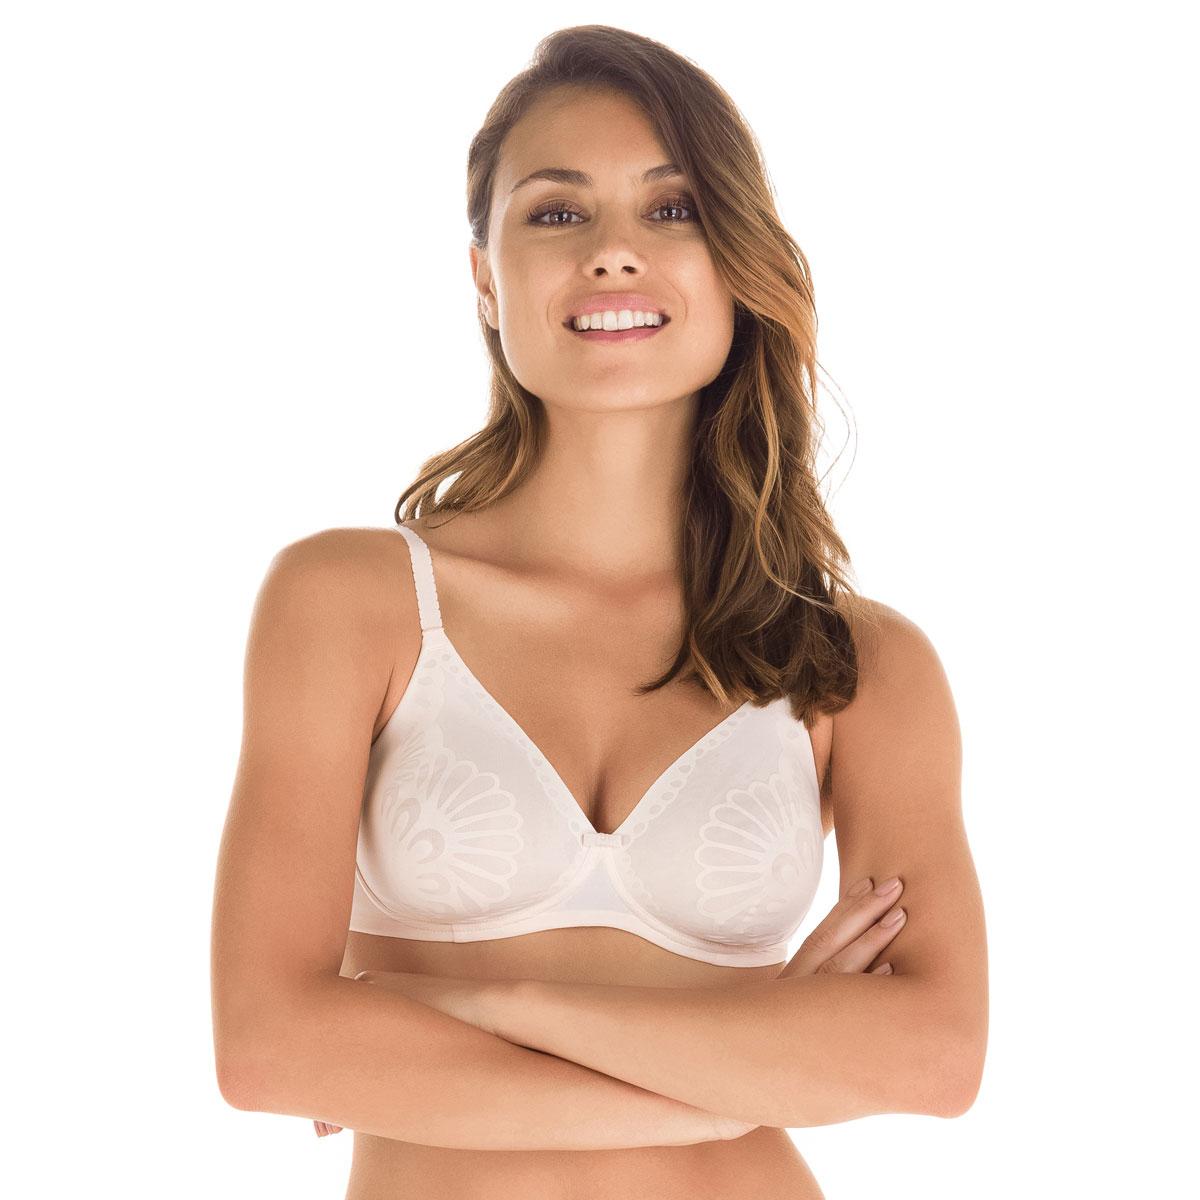 Soutien-gorge rose ballerine sans armatures Nude Support